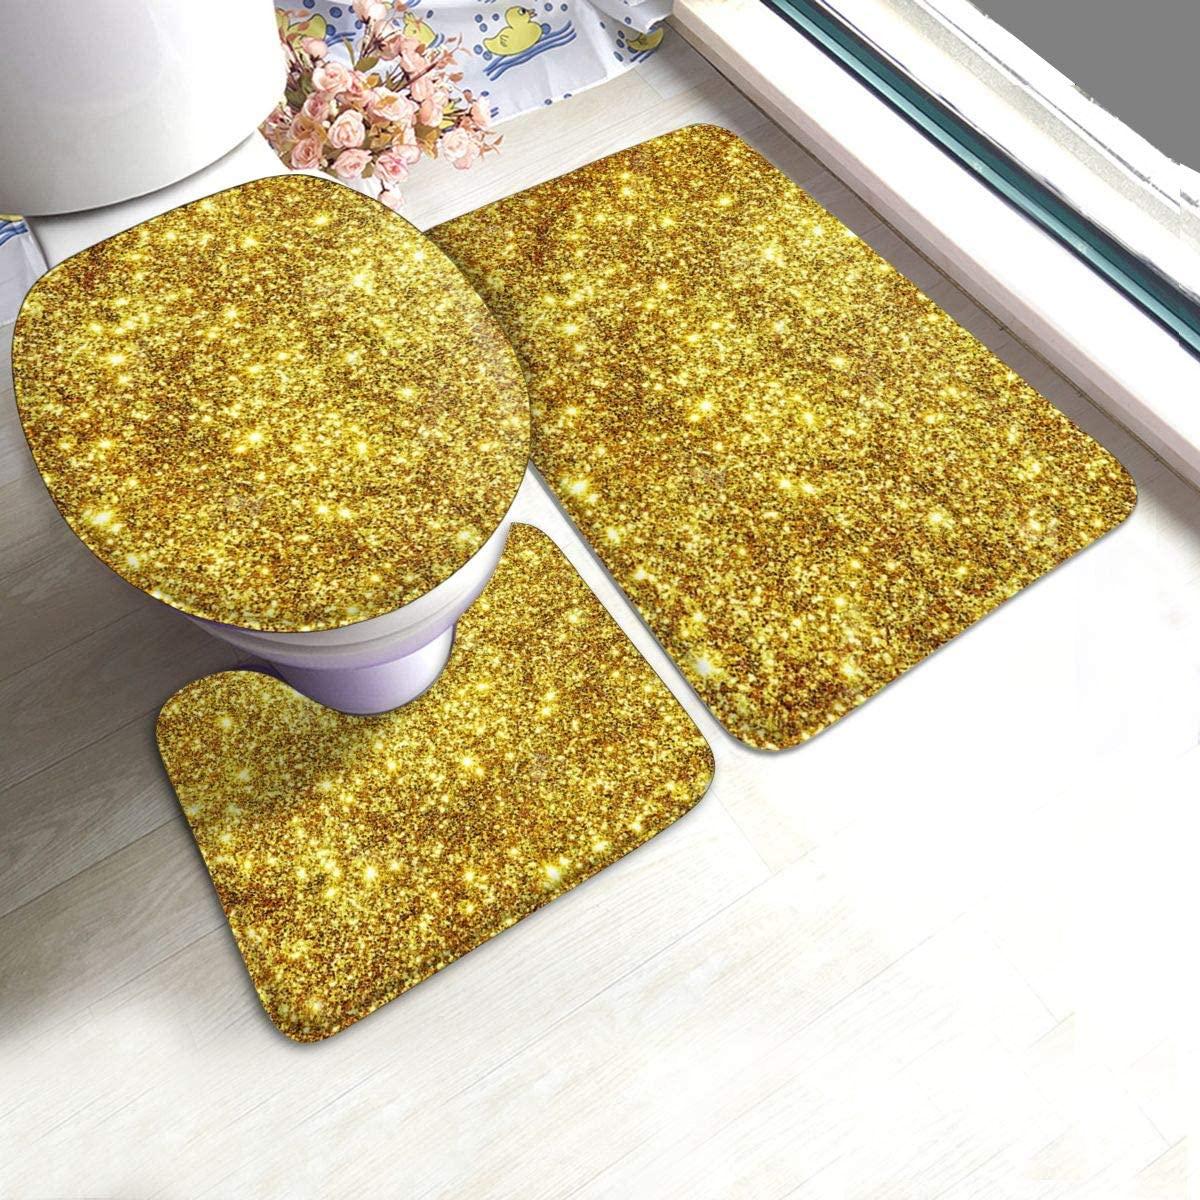 Bathroom Rugs Set Placer Gold Soft Non Slip and Absorbent Bathroom Rug Set of 3